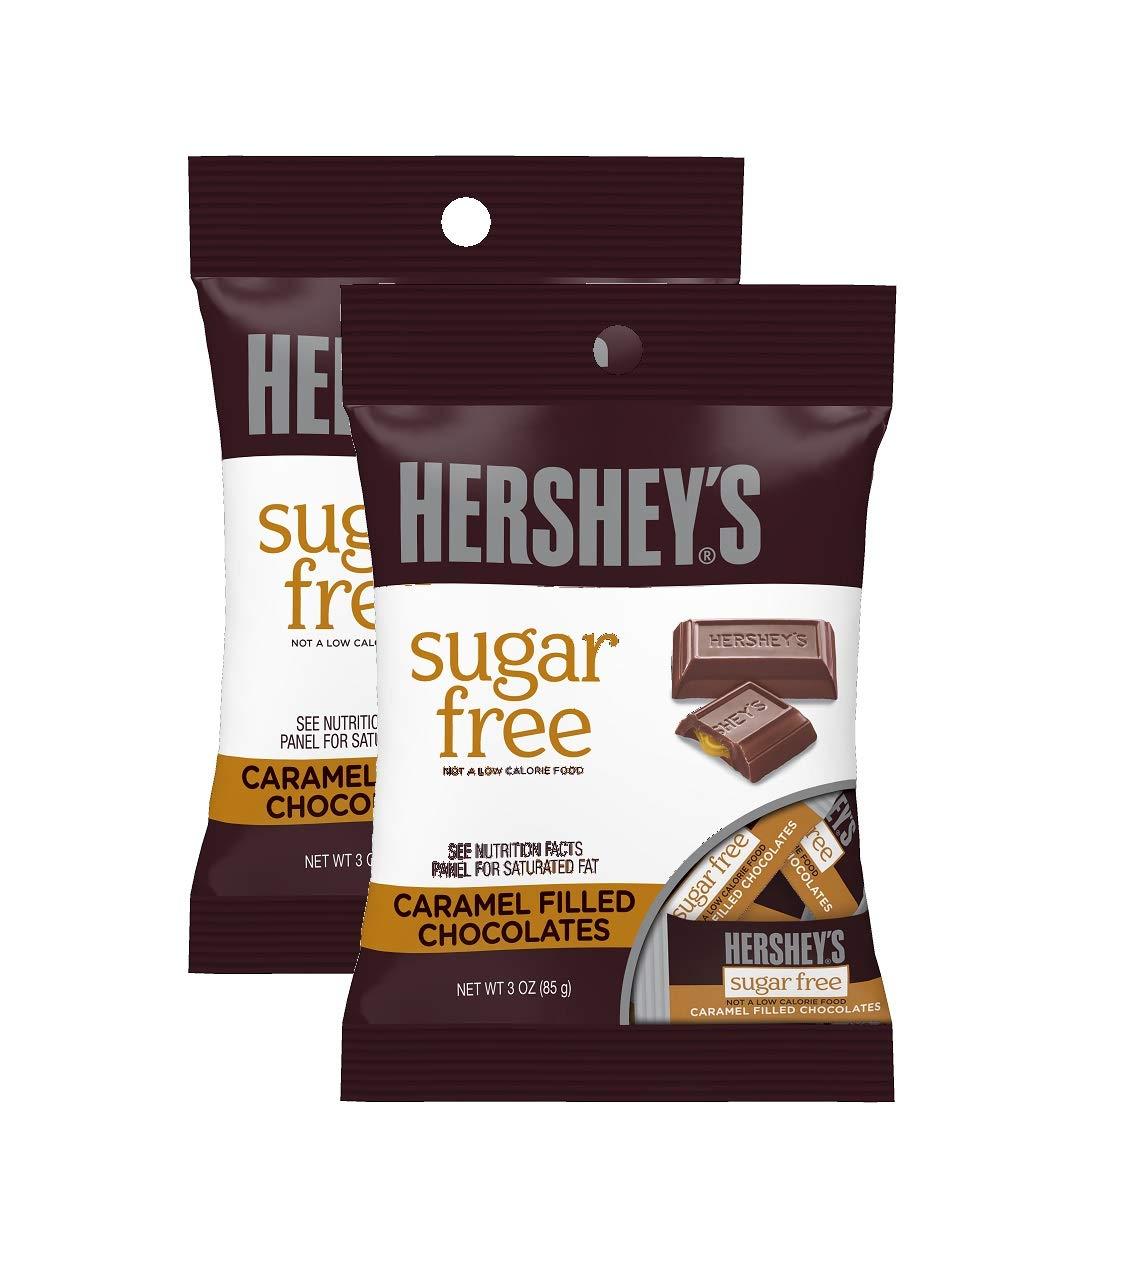 Sugar Free Hershey's Caramel Filled Chocolates, 3oz - Pack of 2